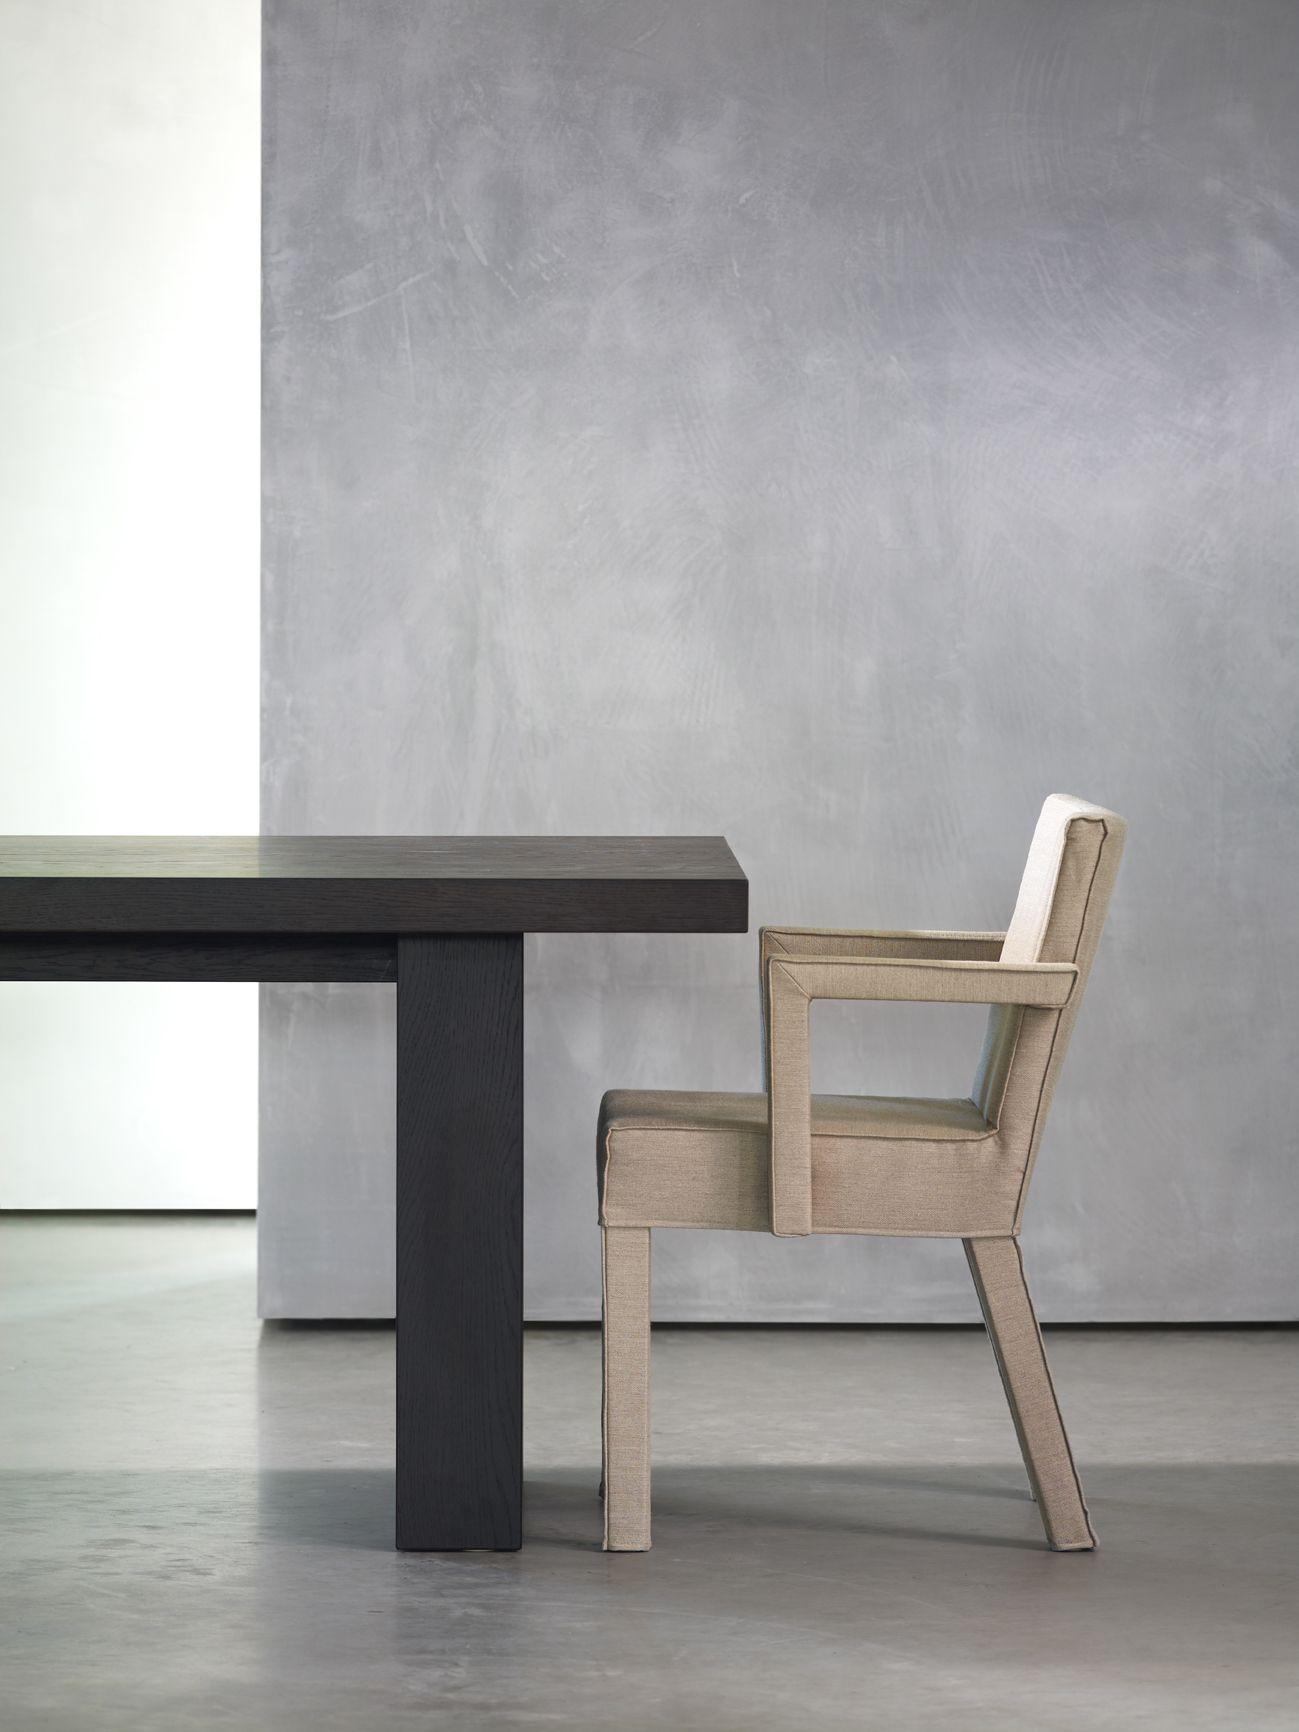 Superieur Piet Boon Collection Furniture   SAAR Armchair U0026 GERRIT Dining Table